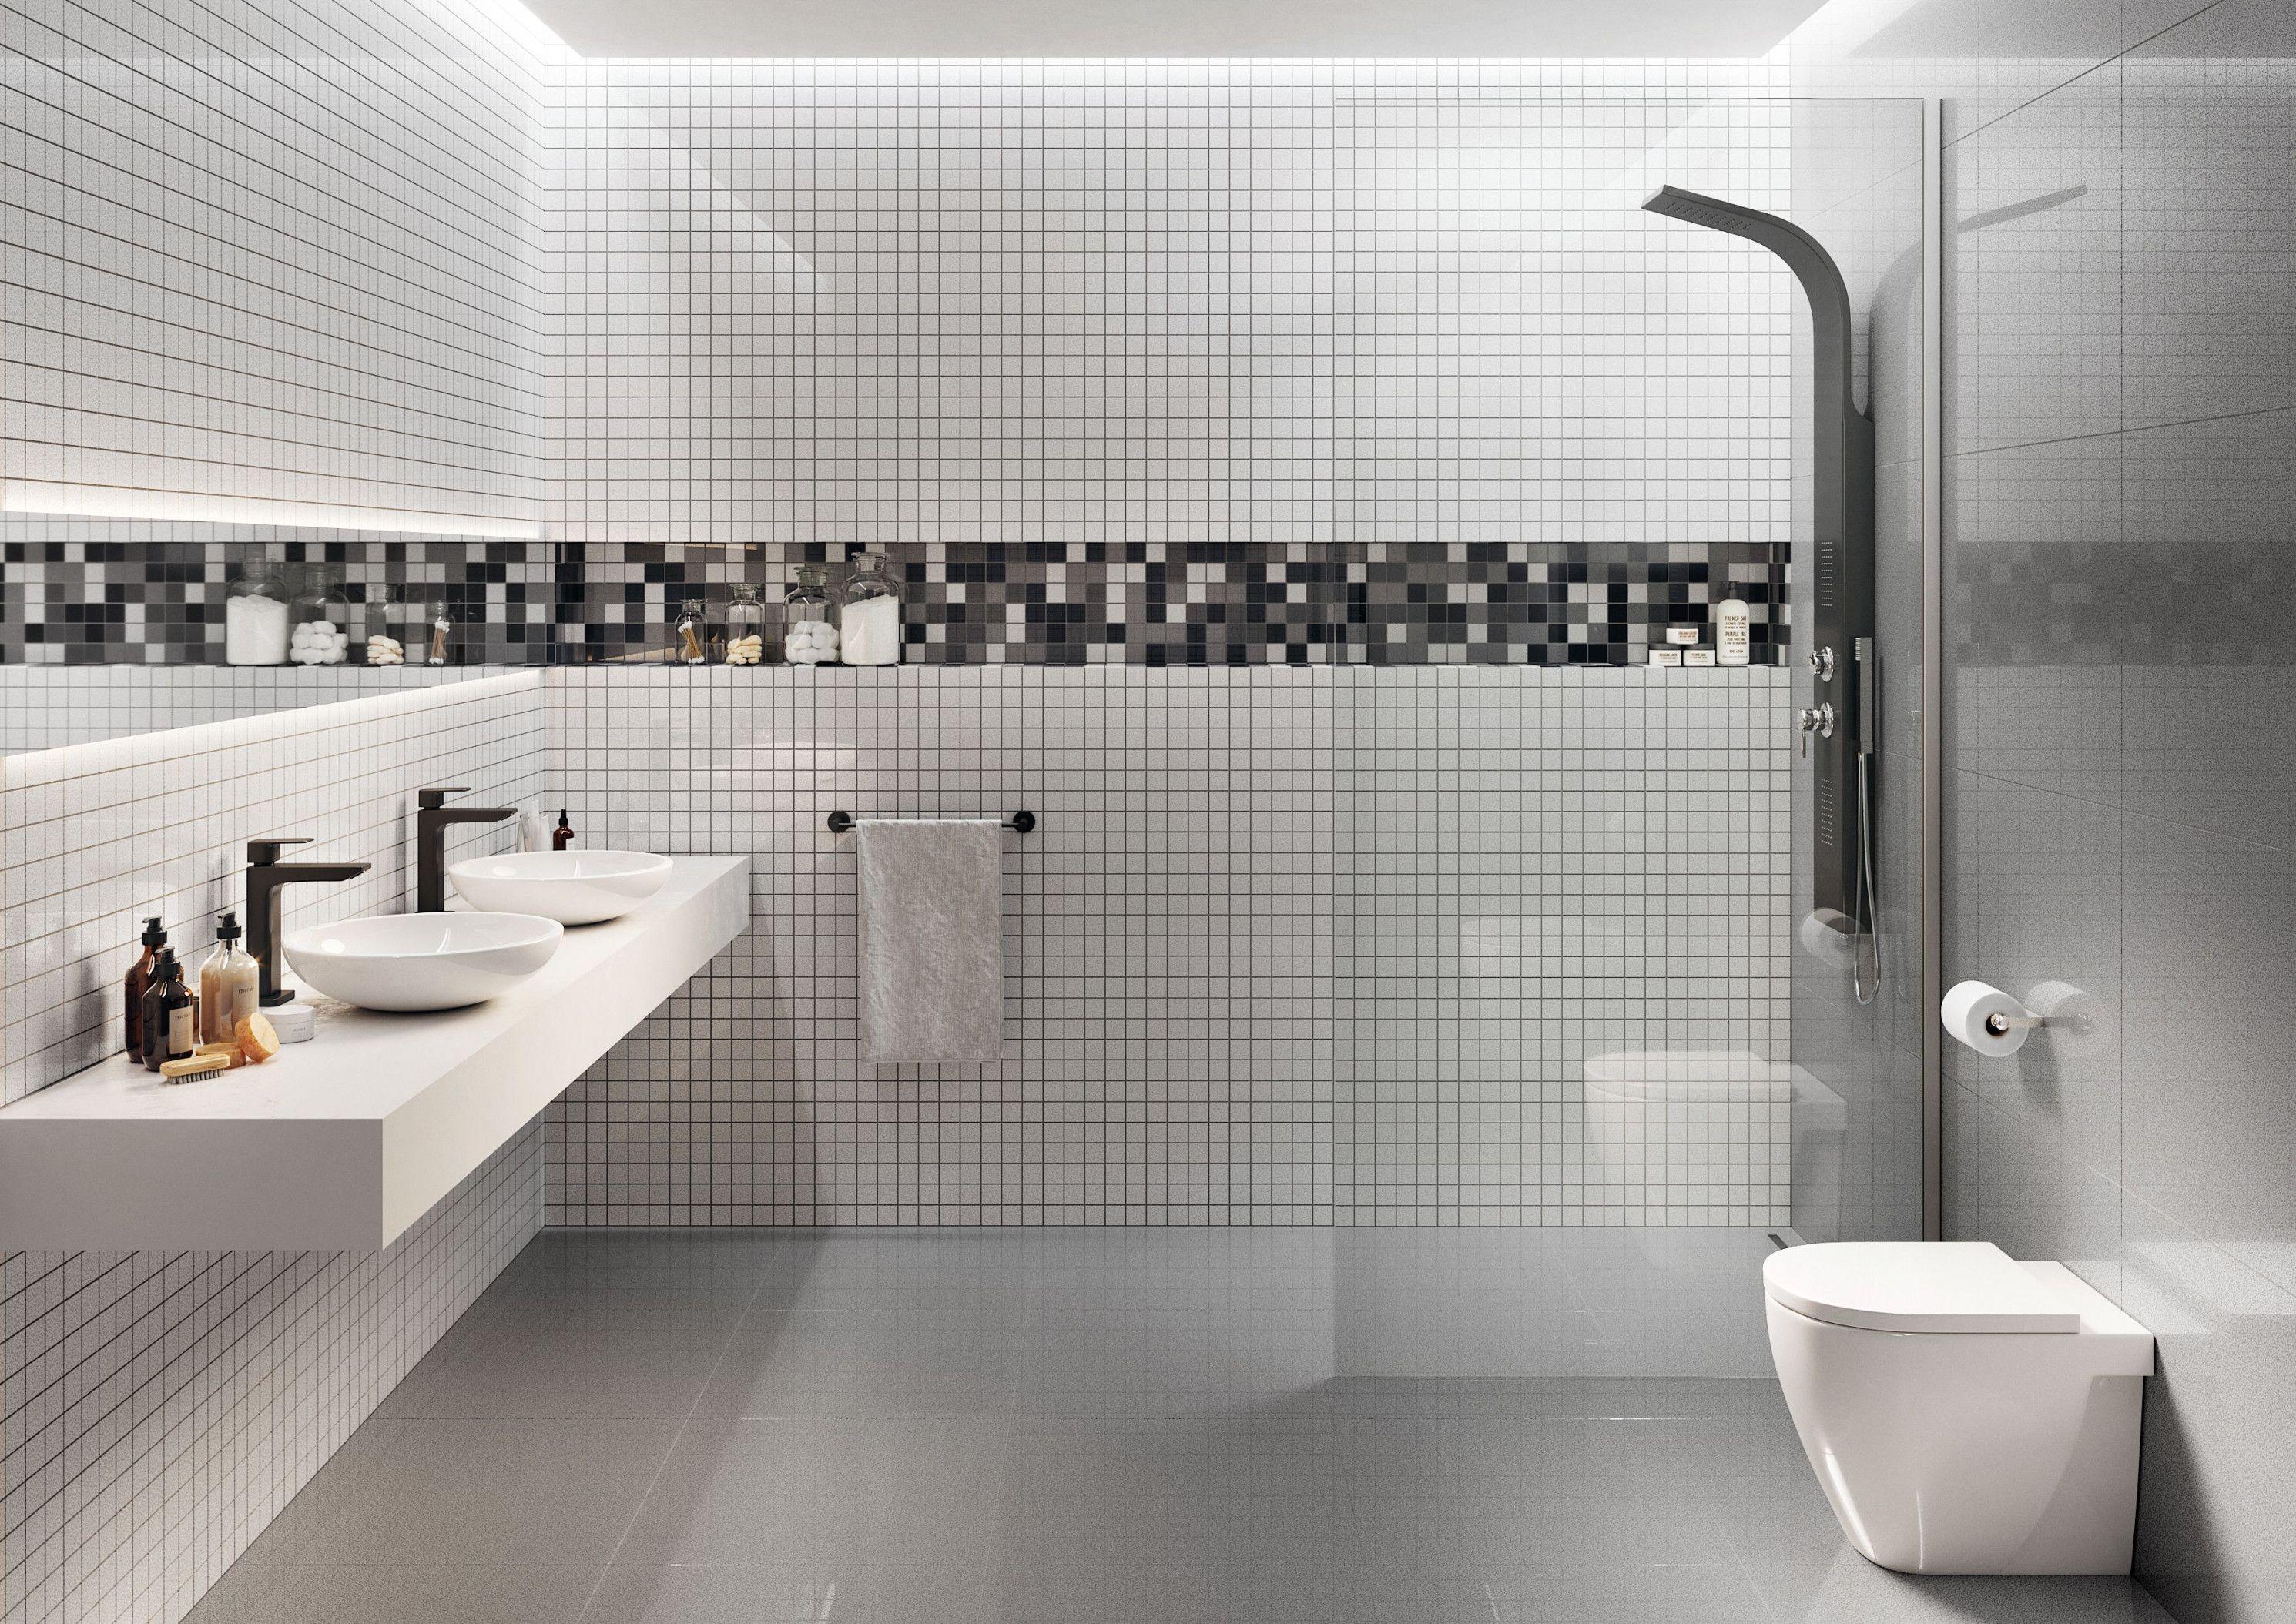 Schone Badezimmer Fliesen Badezimmer Neu Gestalten Bad Neu Gestalten Badezimmer Fliesen